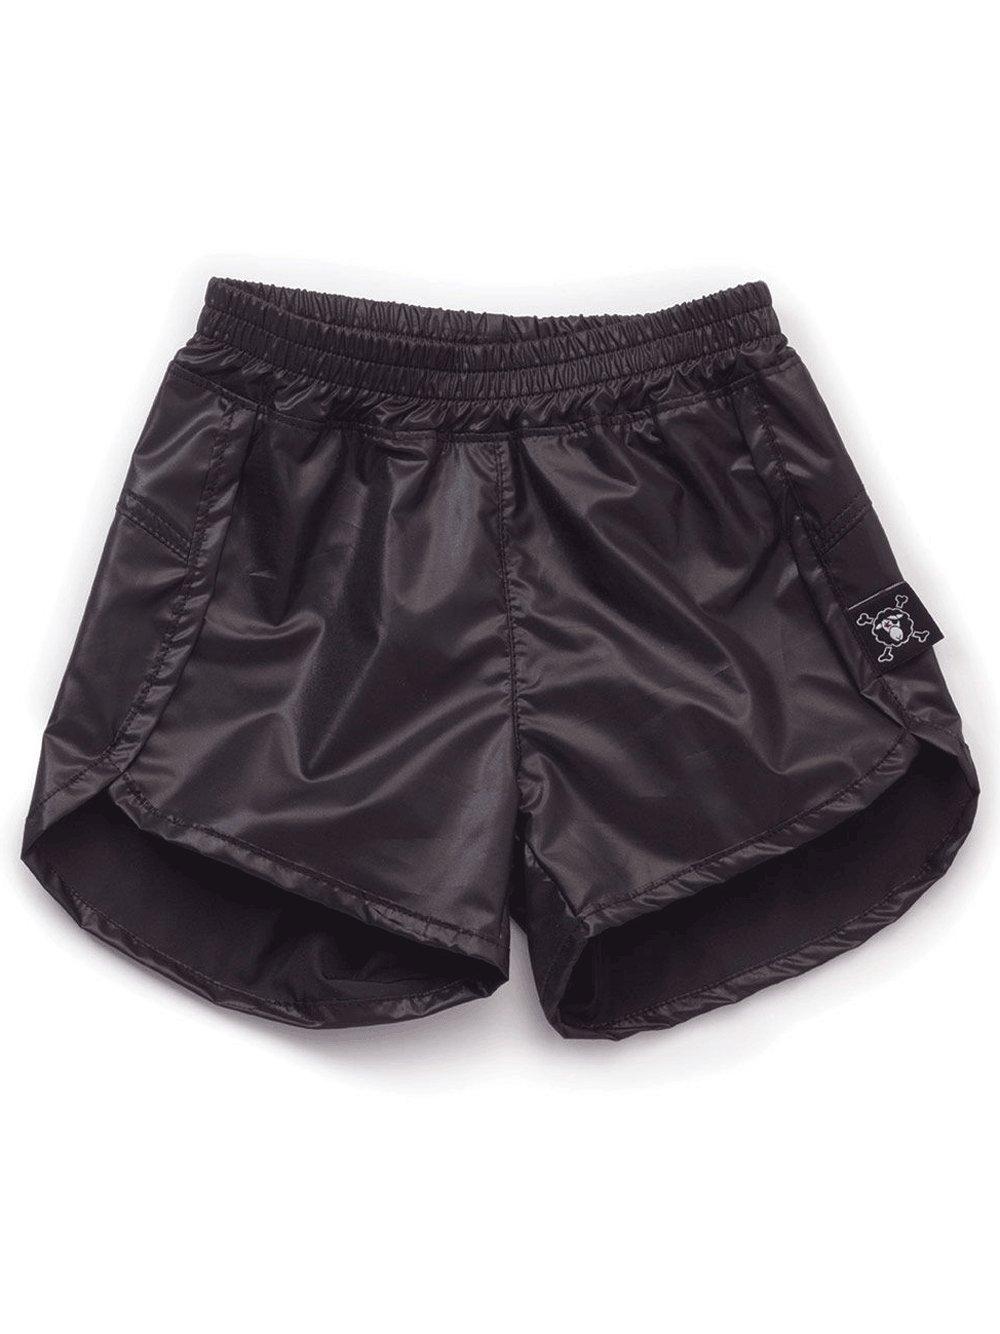 NUNUNU Girls' Nylon Gym Shorts Sz 4-5 Years Black